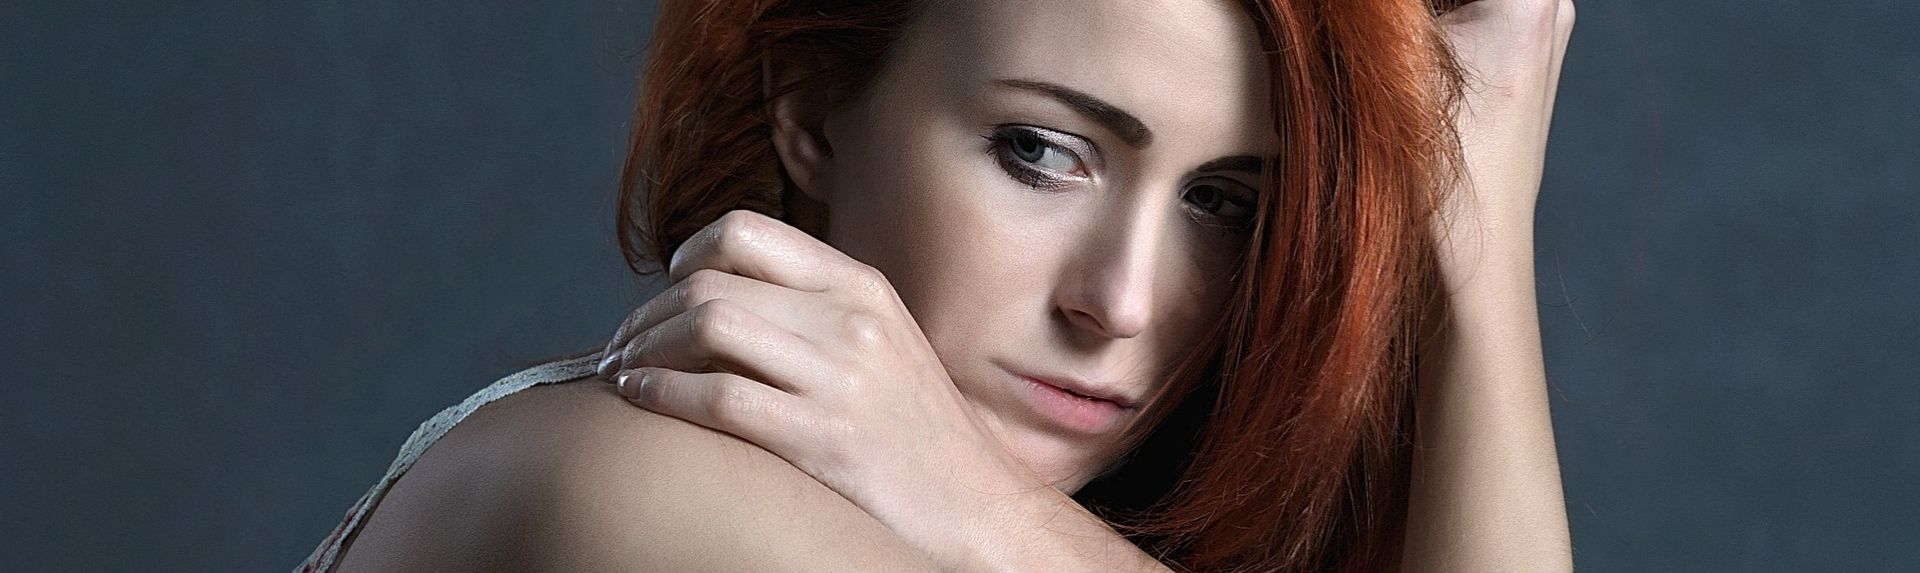 Боли после осмотра гинеколога